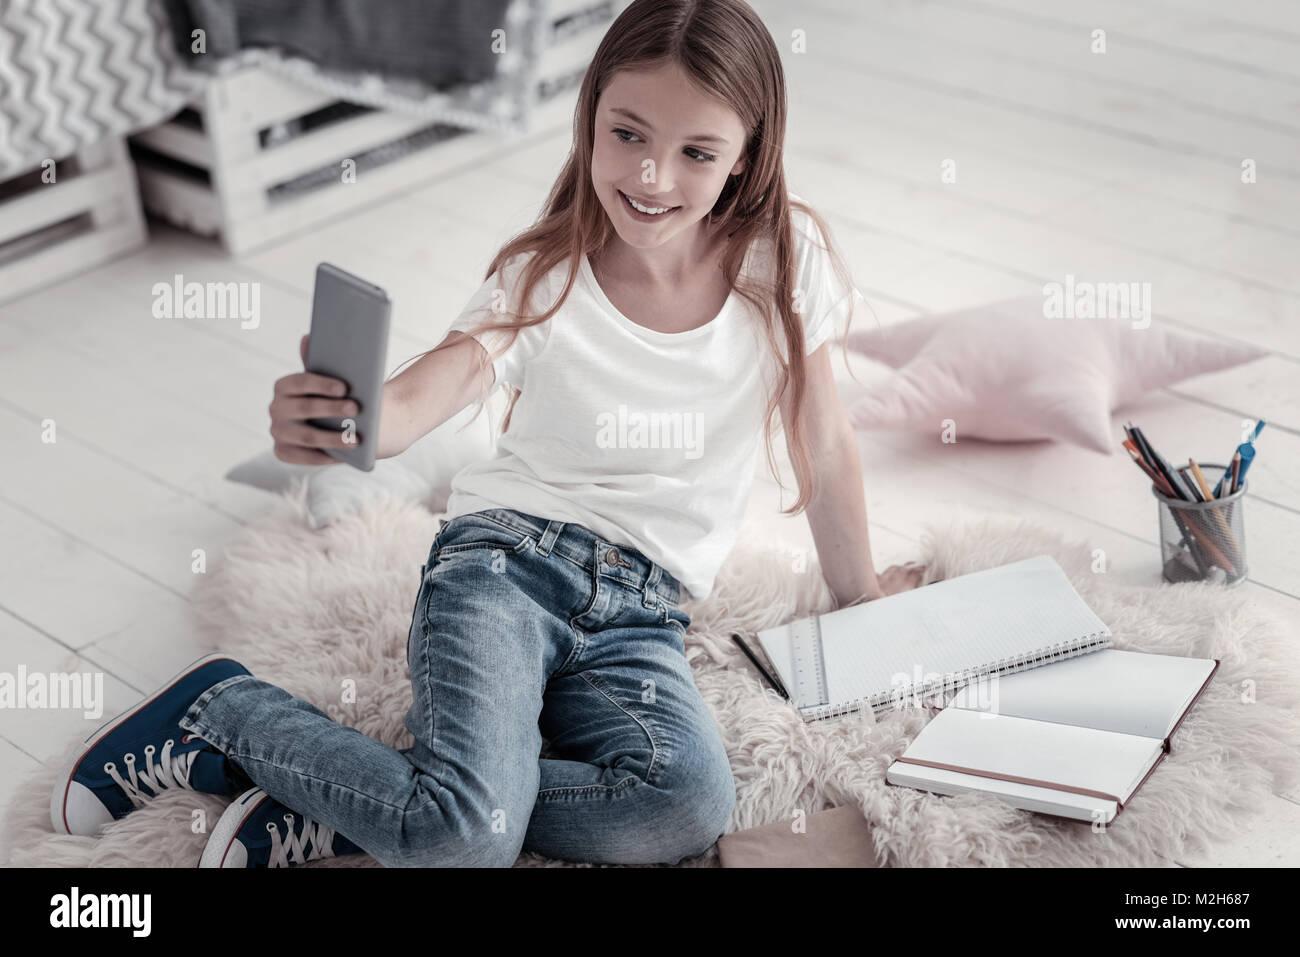 Smiling girl taking selfies on the floor - Stock Image